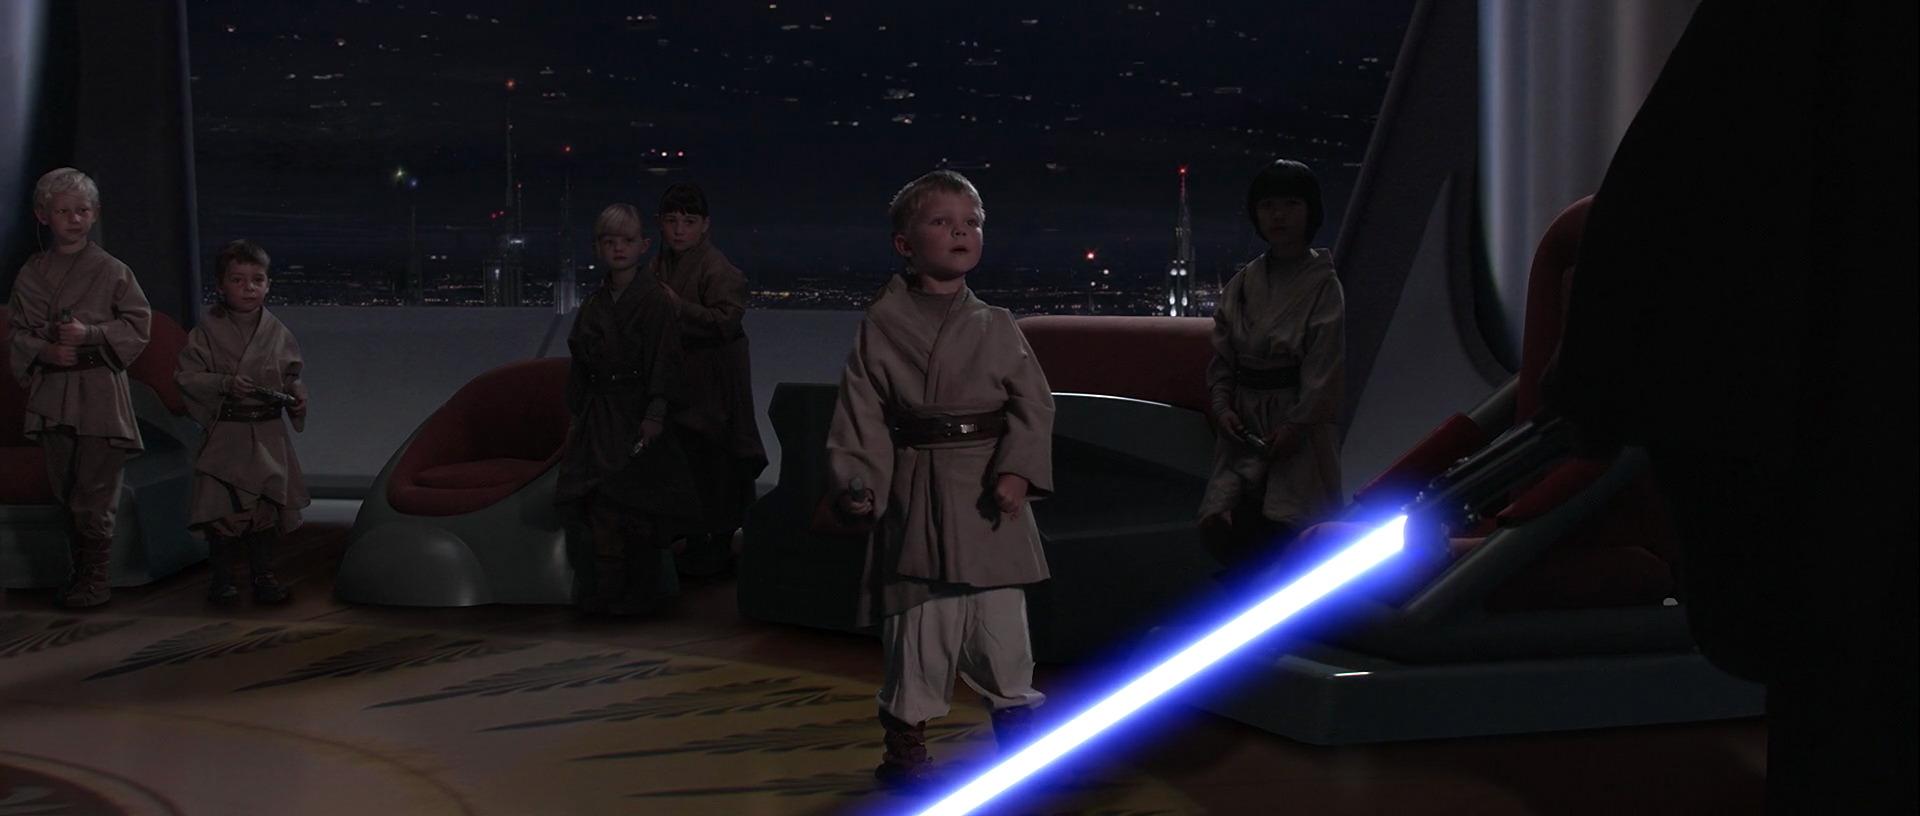 star wars revenge of the sith anakin skywalker hayden christensen kill the younglings padawan